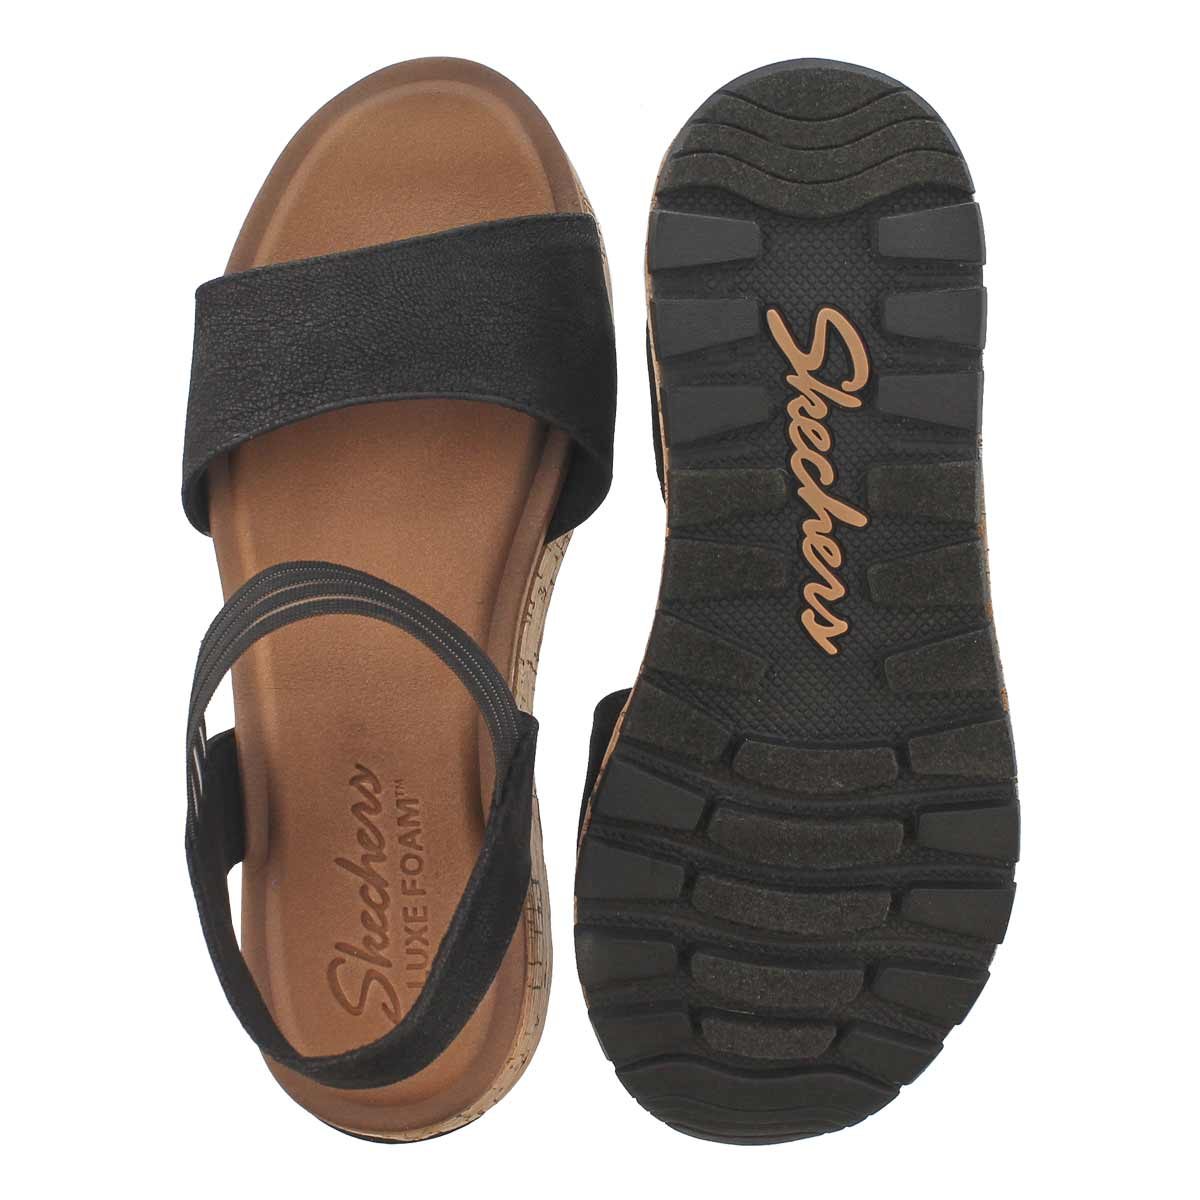 Lds Footstep Markers blk wedge sandal